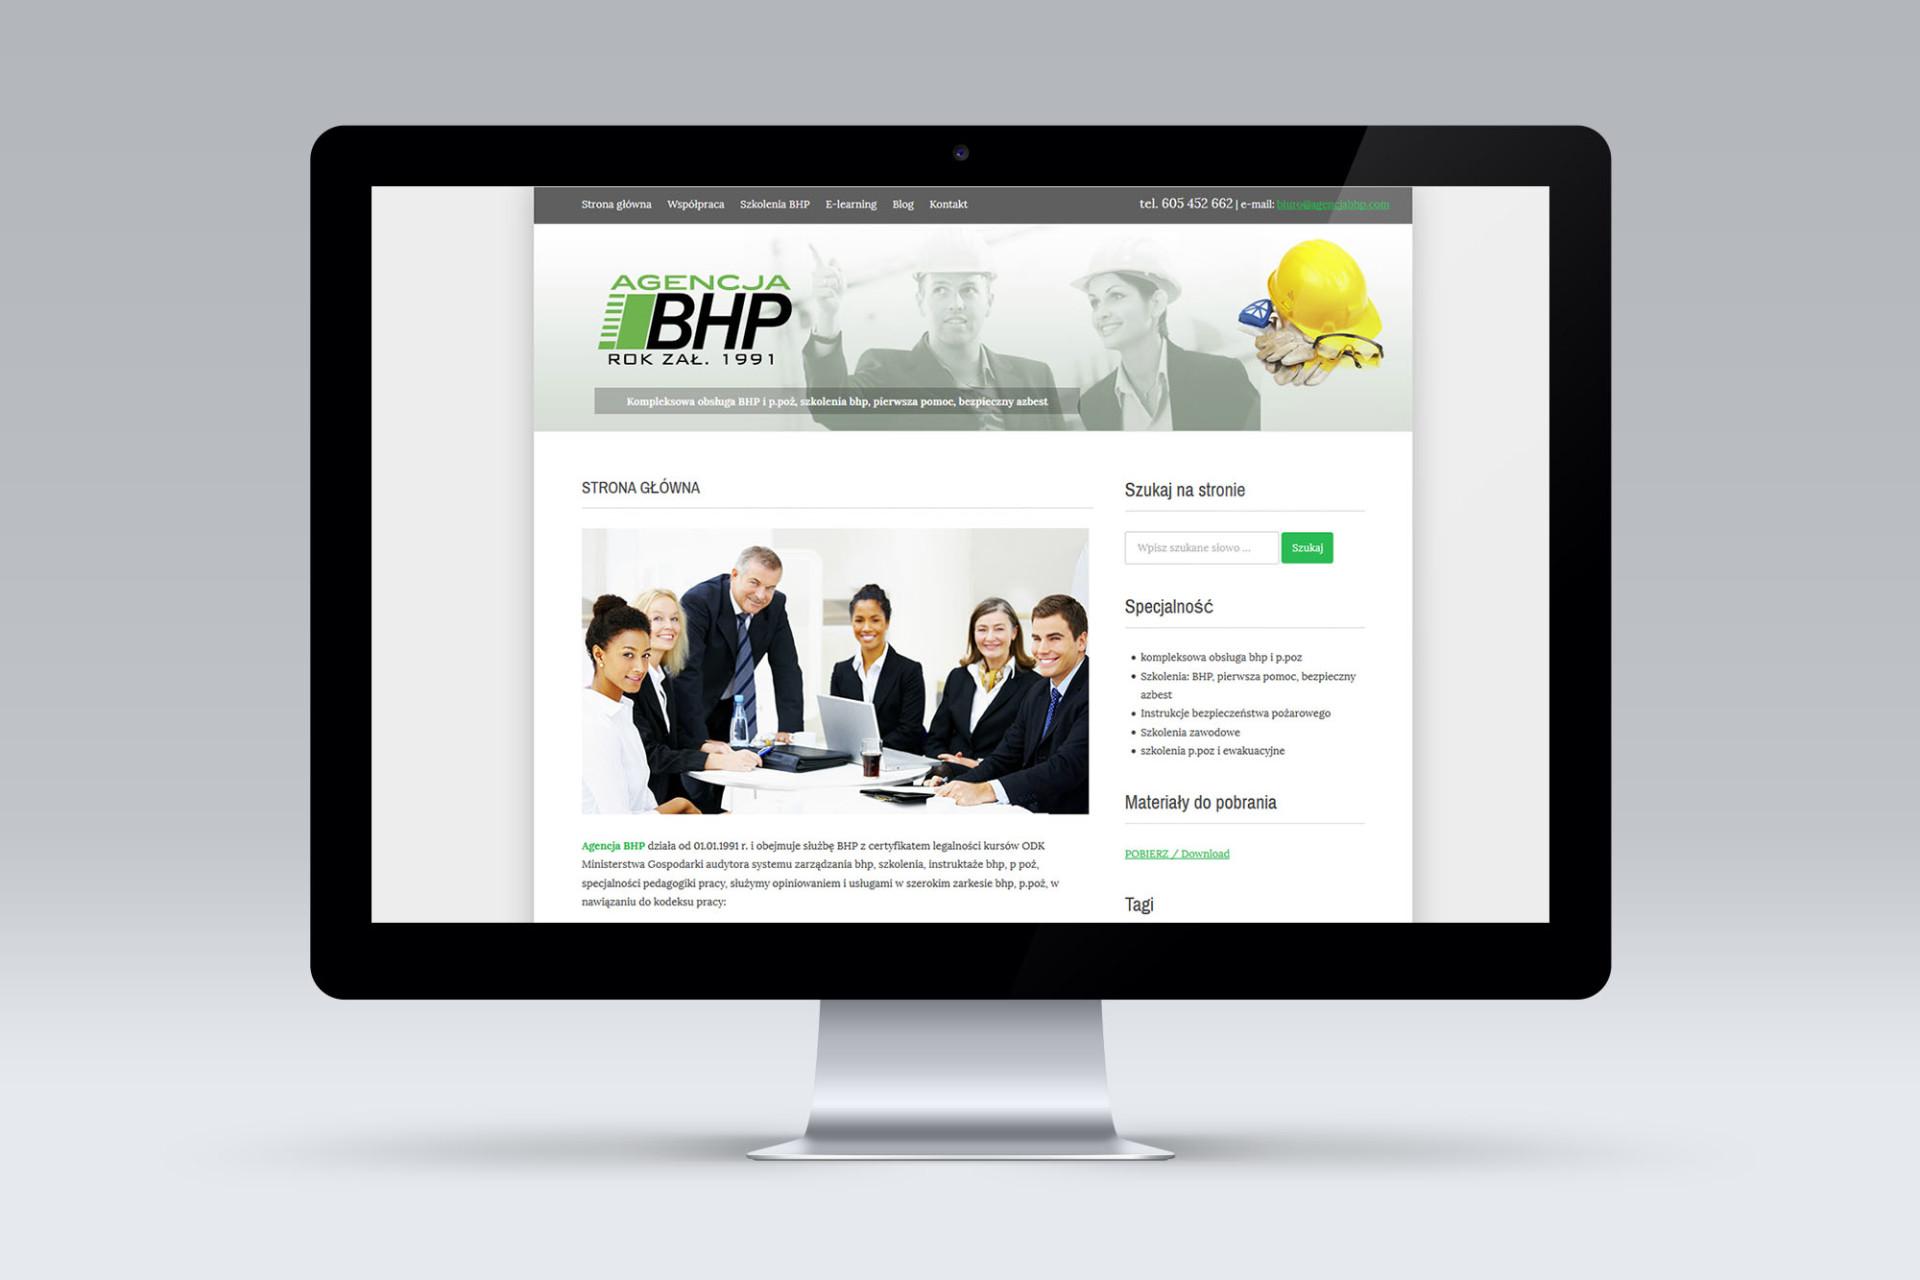 agencja bhp